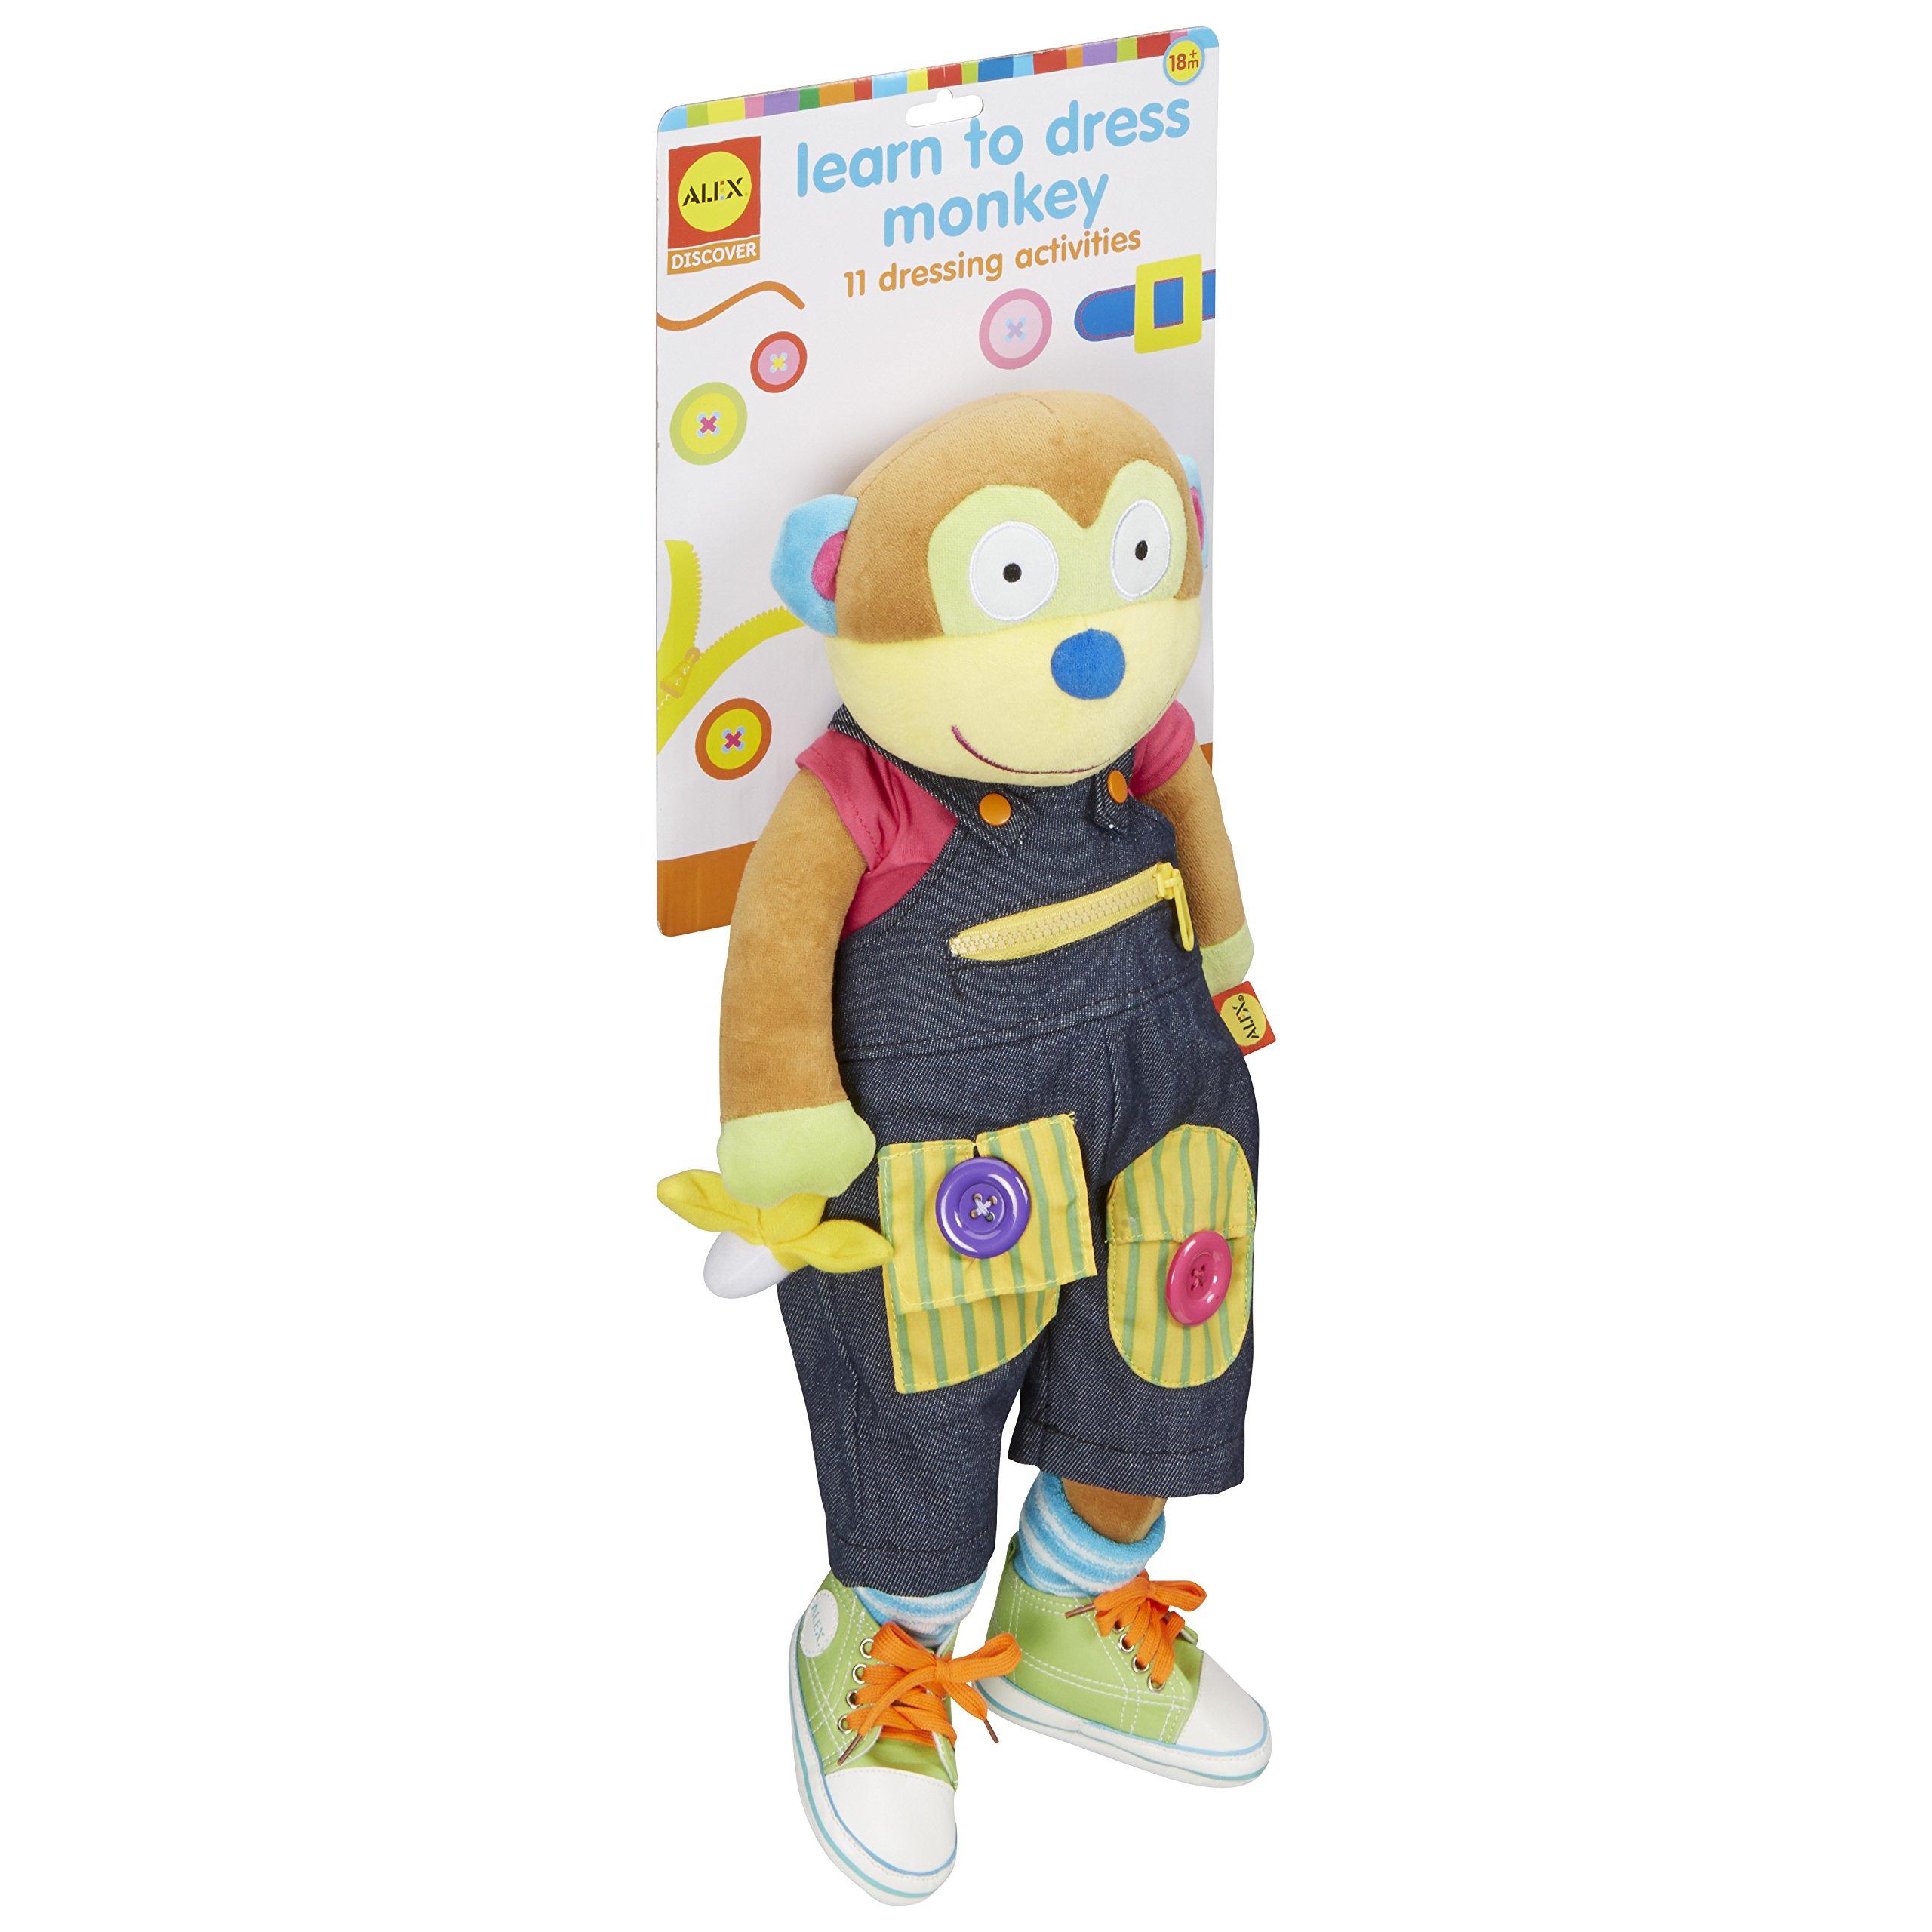 Alex Discover Learn to Dress Monkey